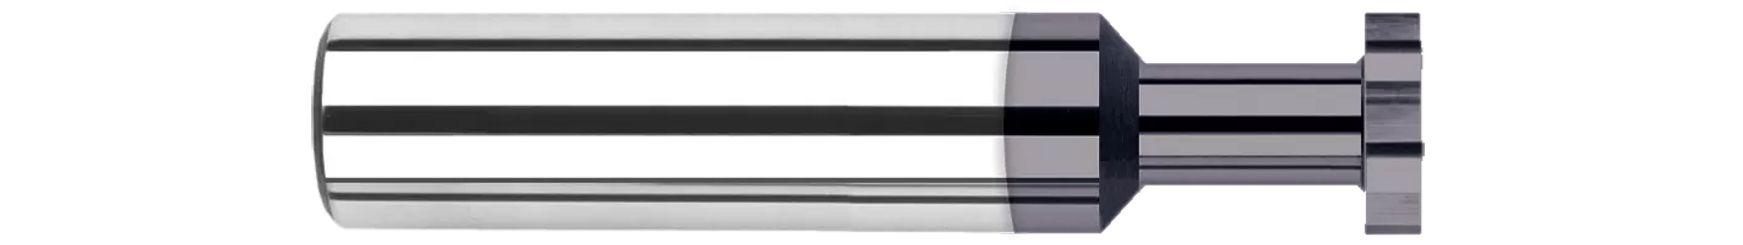 Keyseat Cutters - Retaining Ring Keyseat Cutters